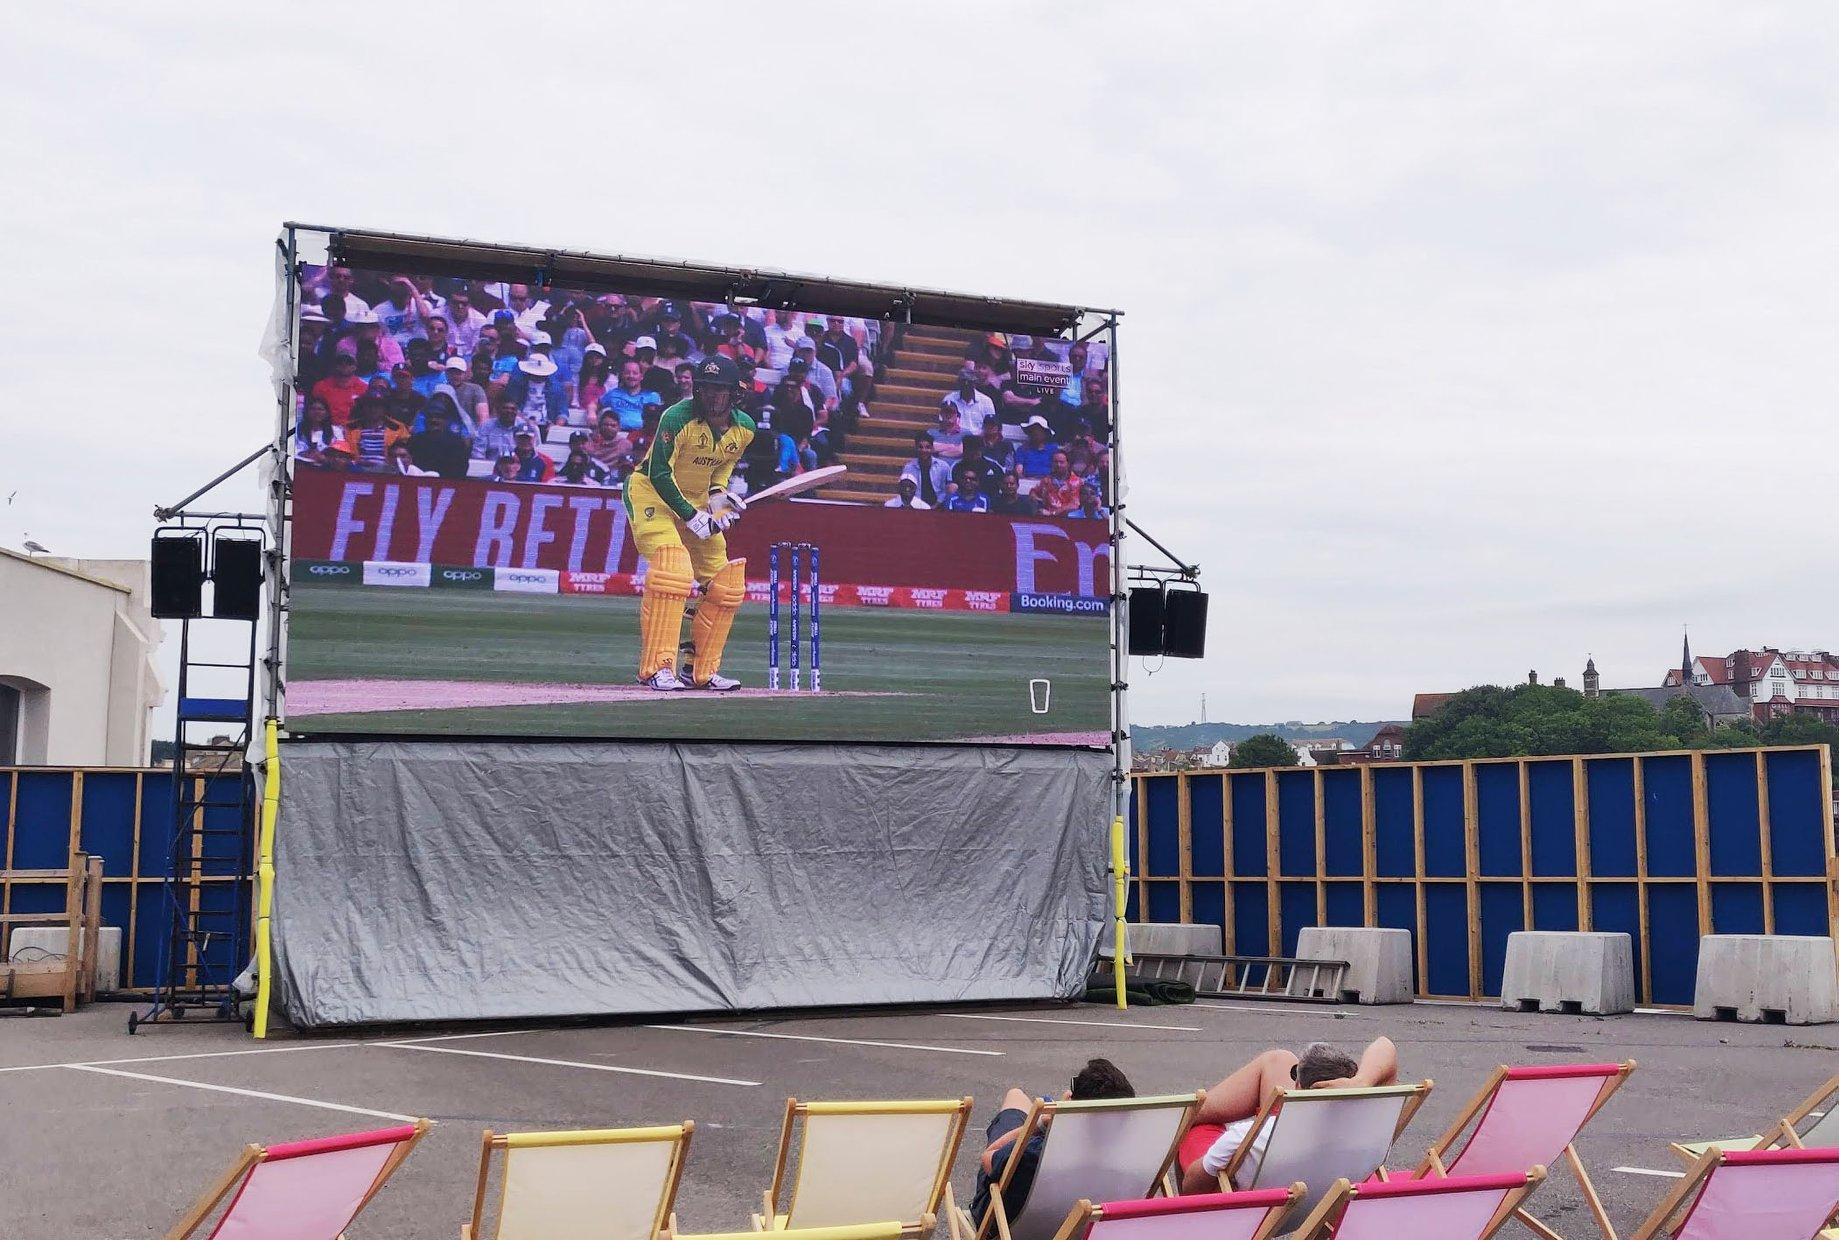 Cricket on the Big Screen